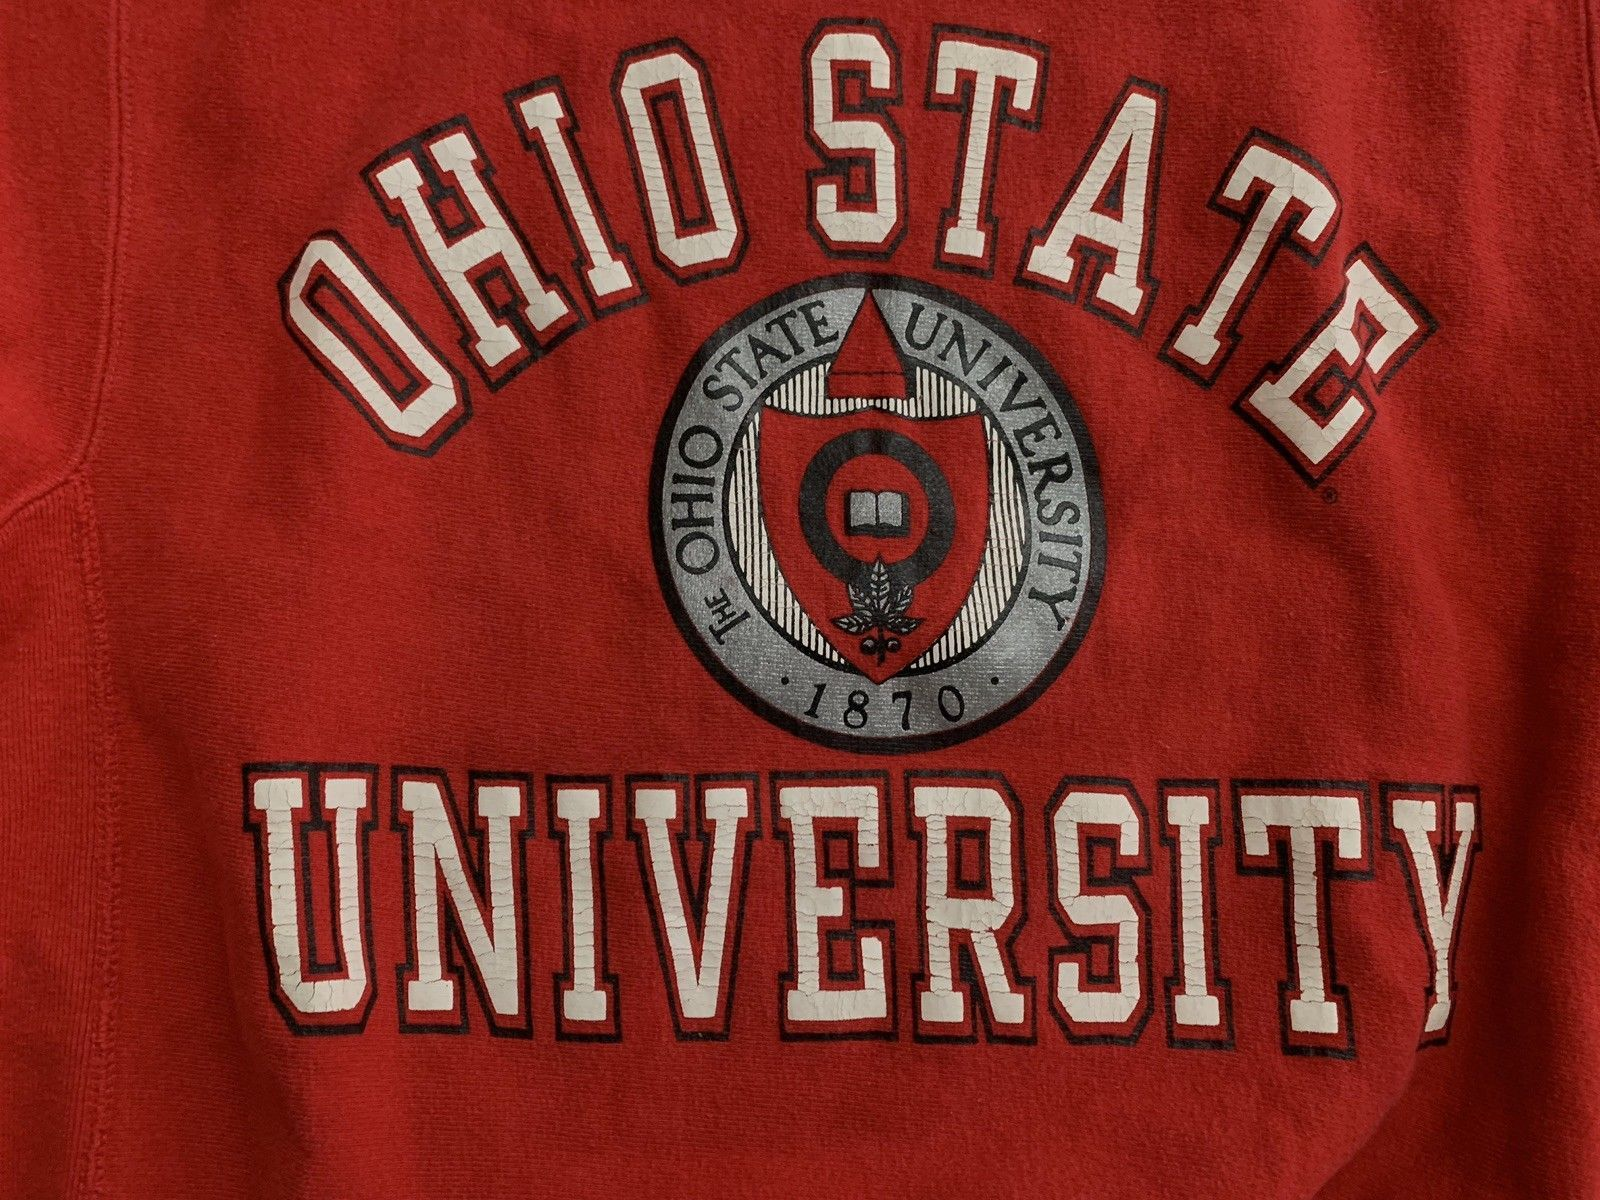 OSU Champion Reverse Weave VTG Ohio State Sweatshirt L Red USA Made Rare Mint